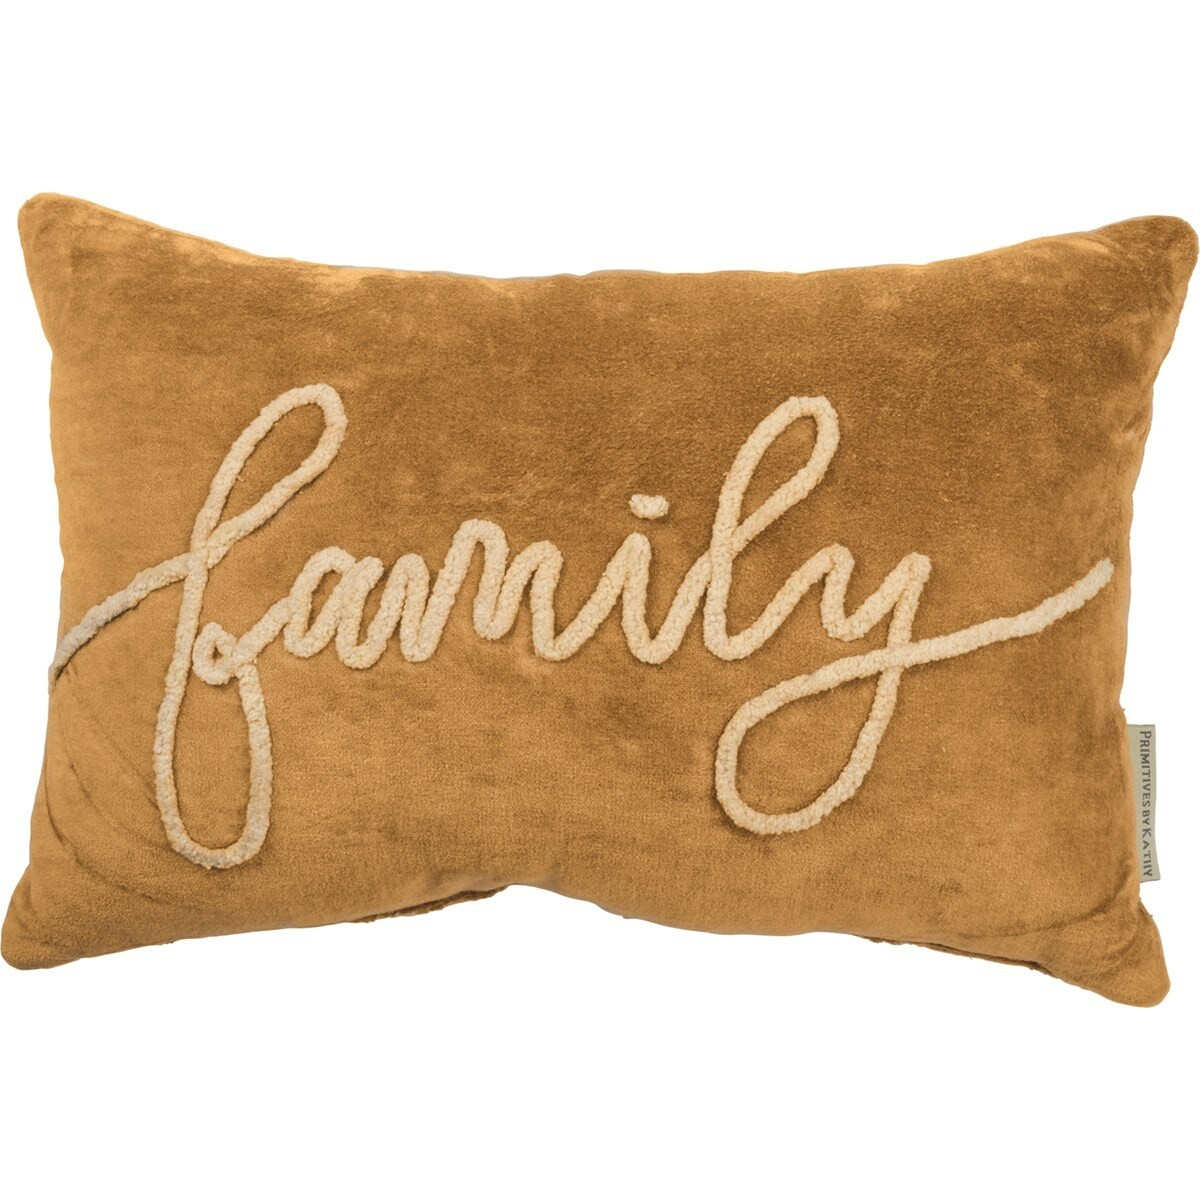 Pillow - Family